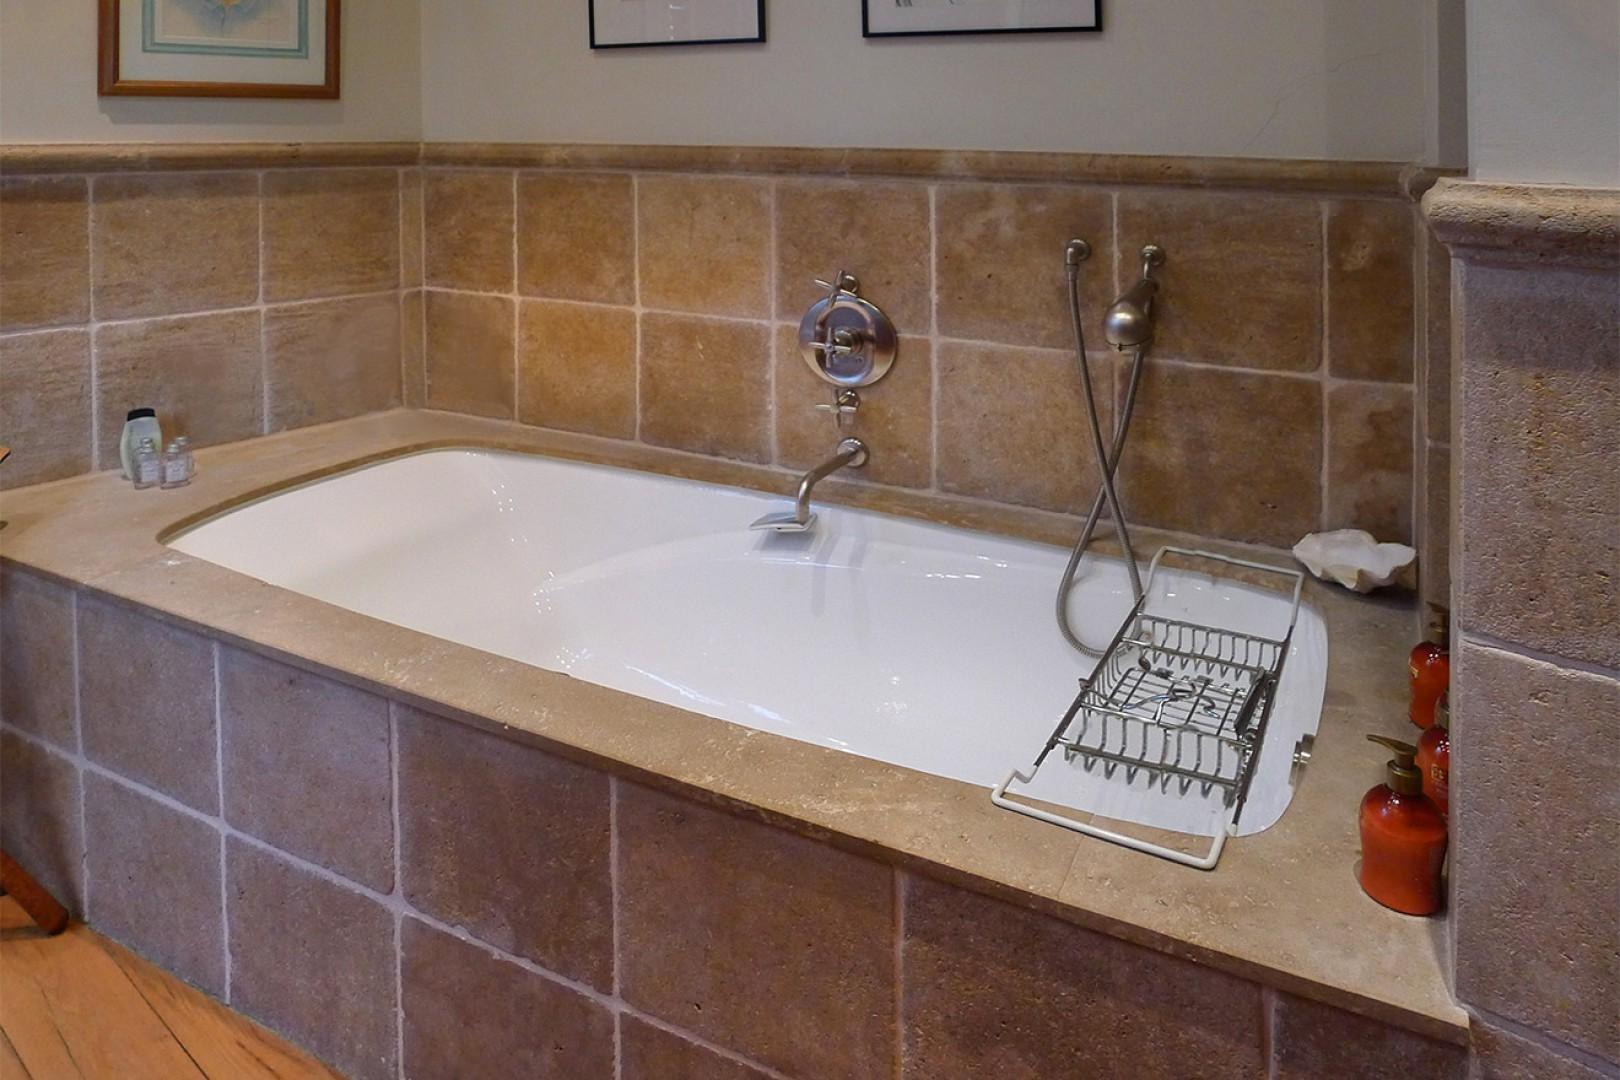 Enjoy a relaxing soak in this luxurious bathtub.